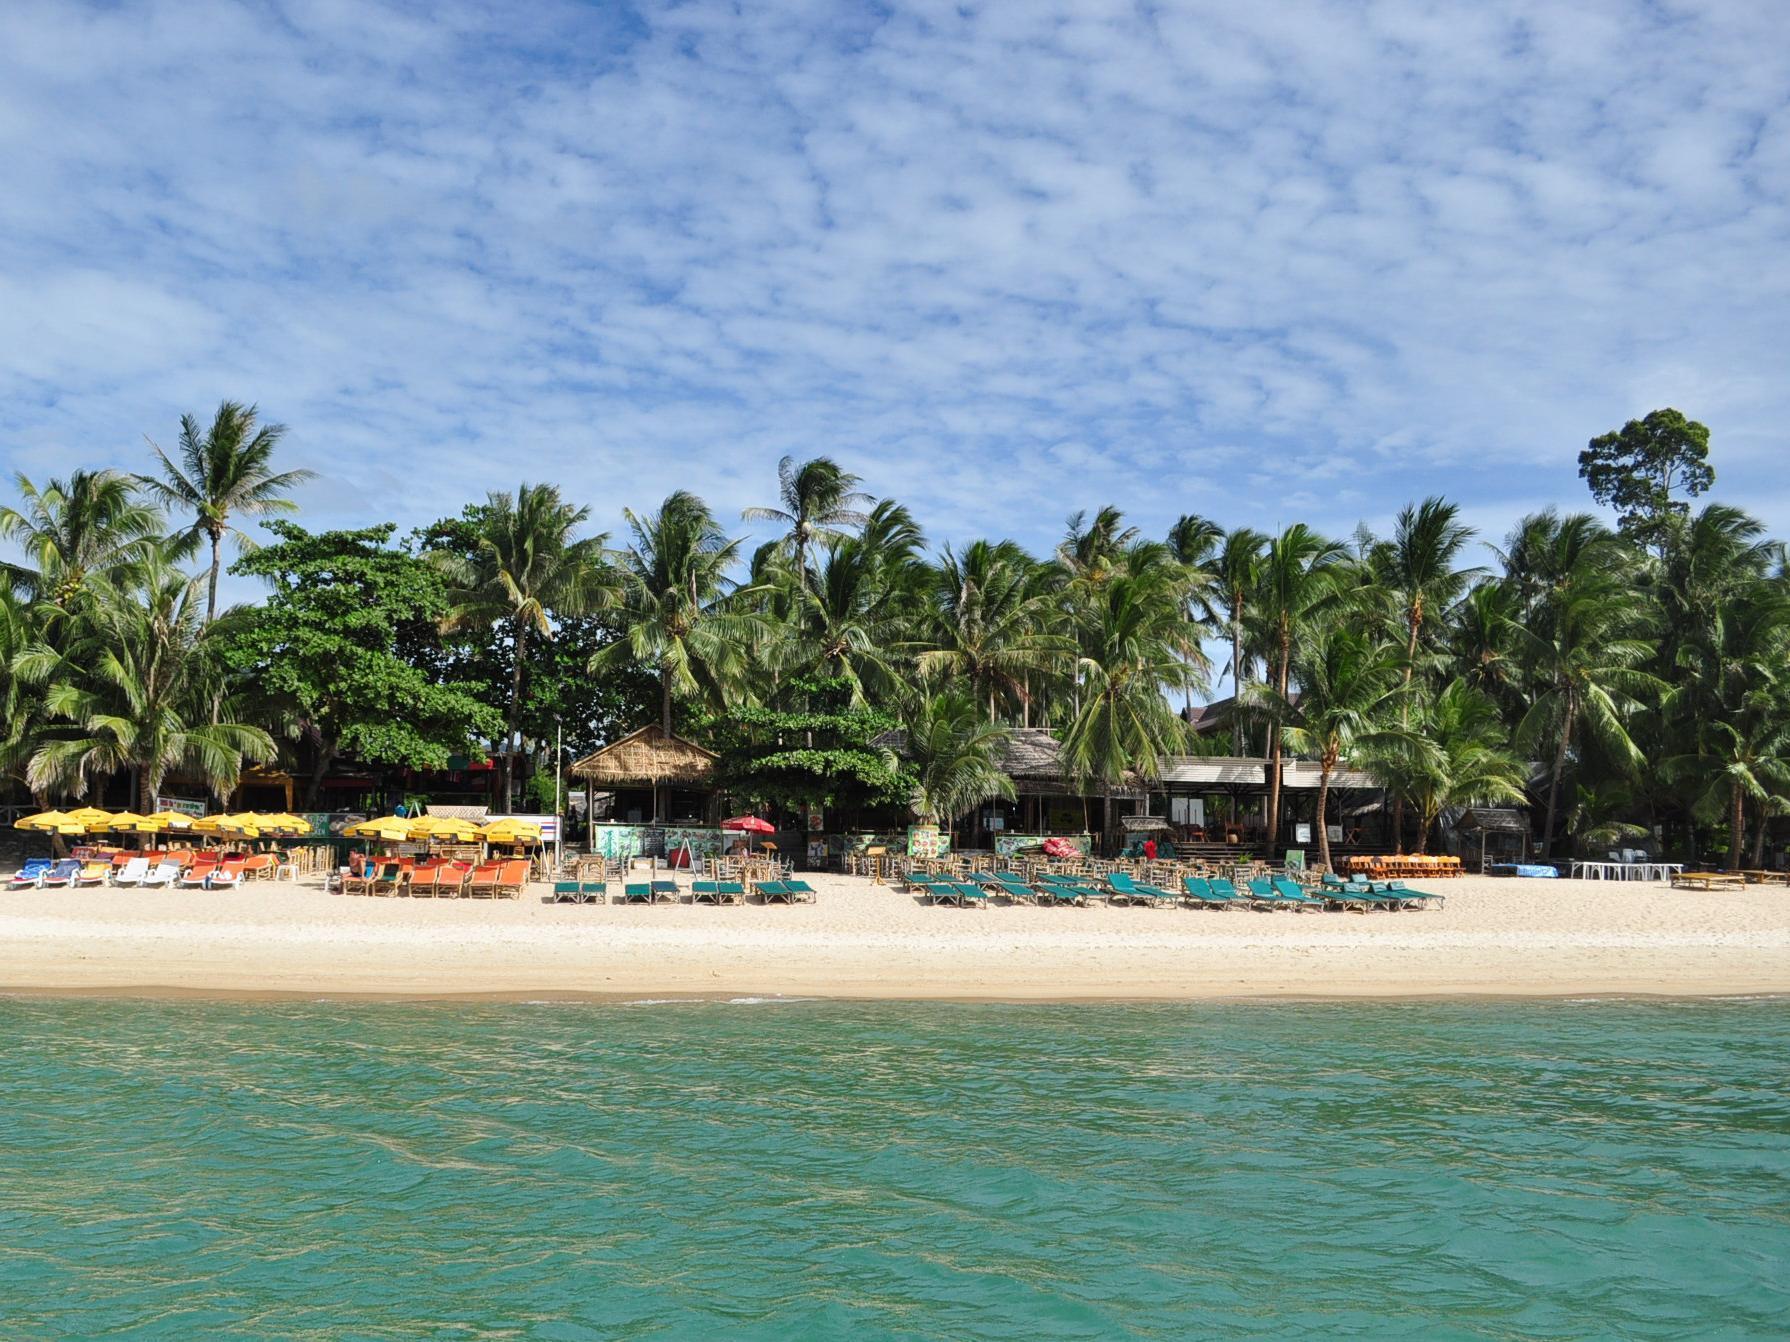 Coconut Beach Resort โคโคนัท บีช รีสอร์ท